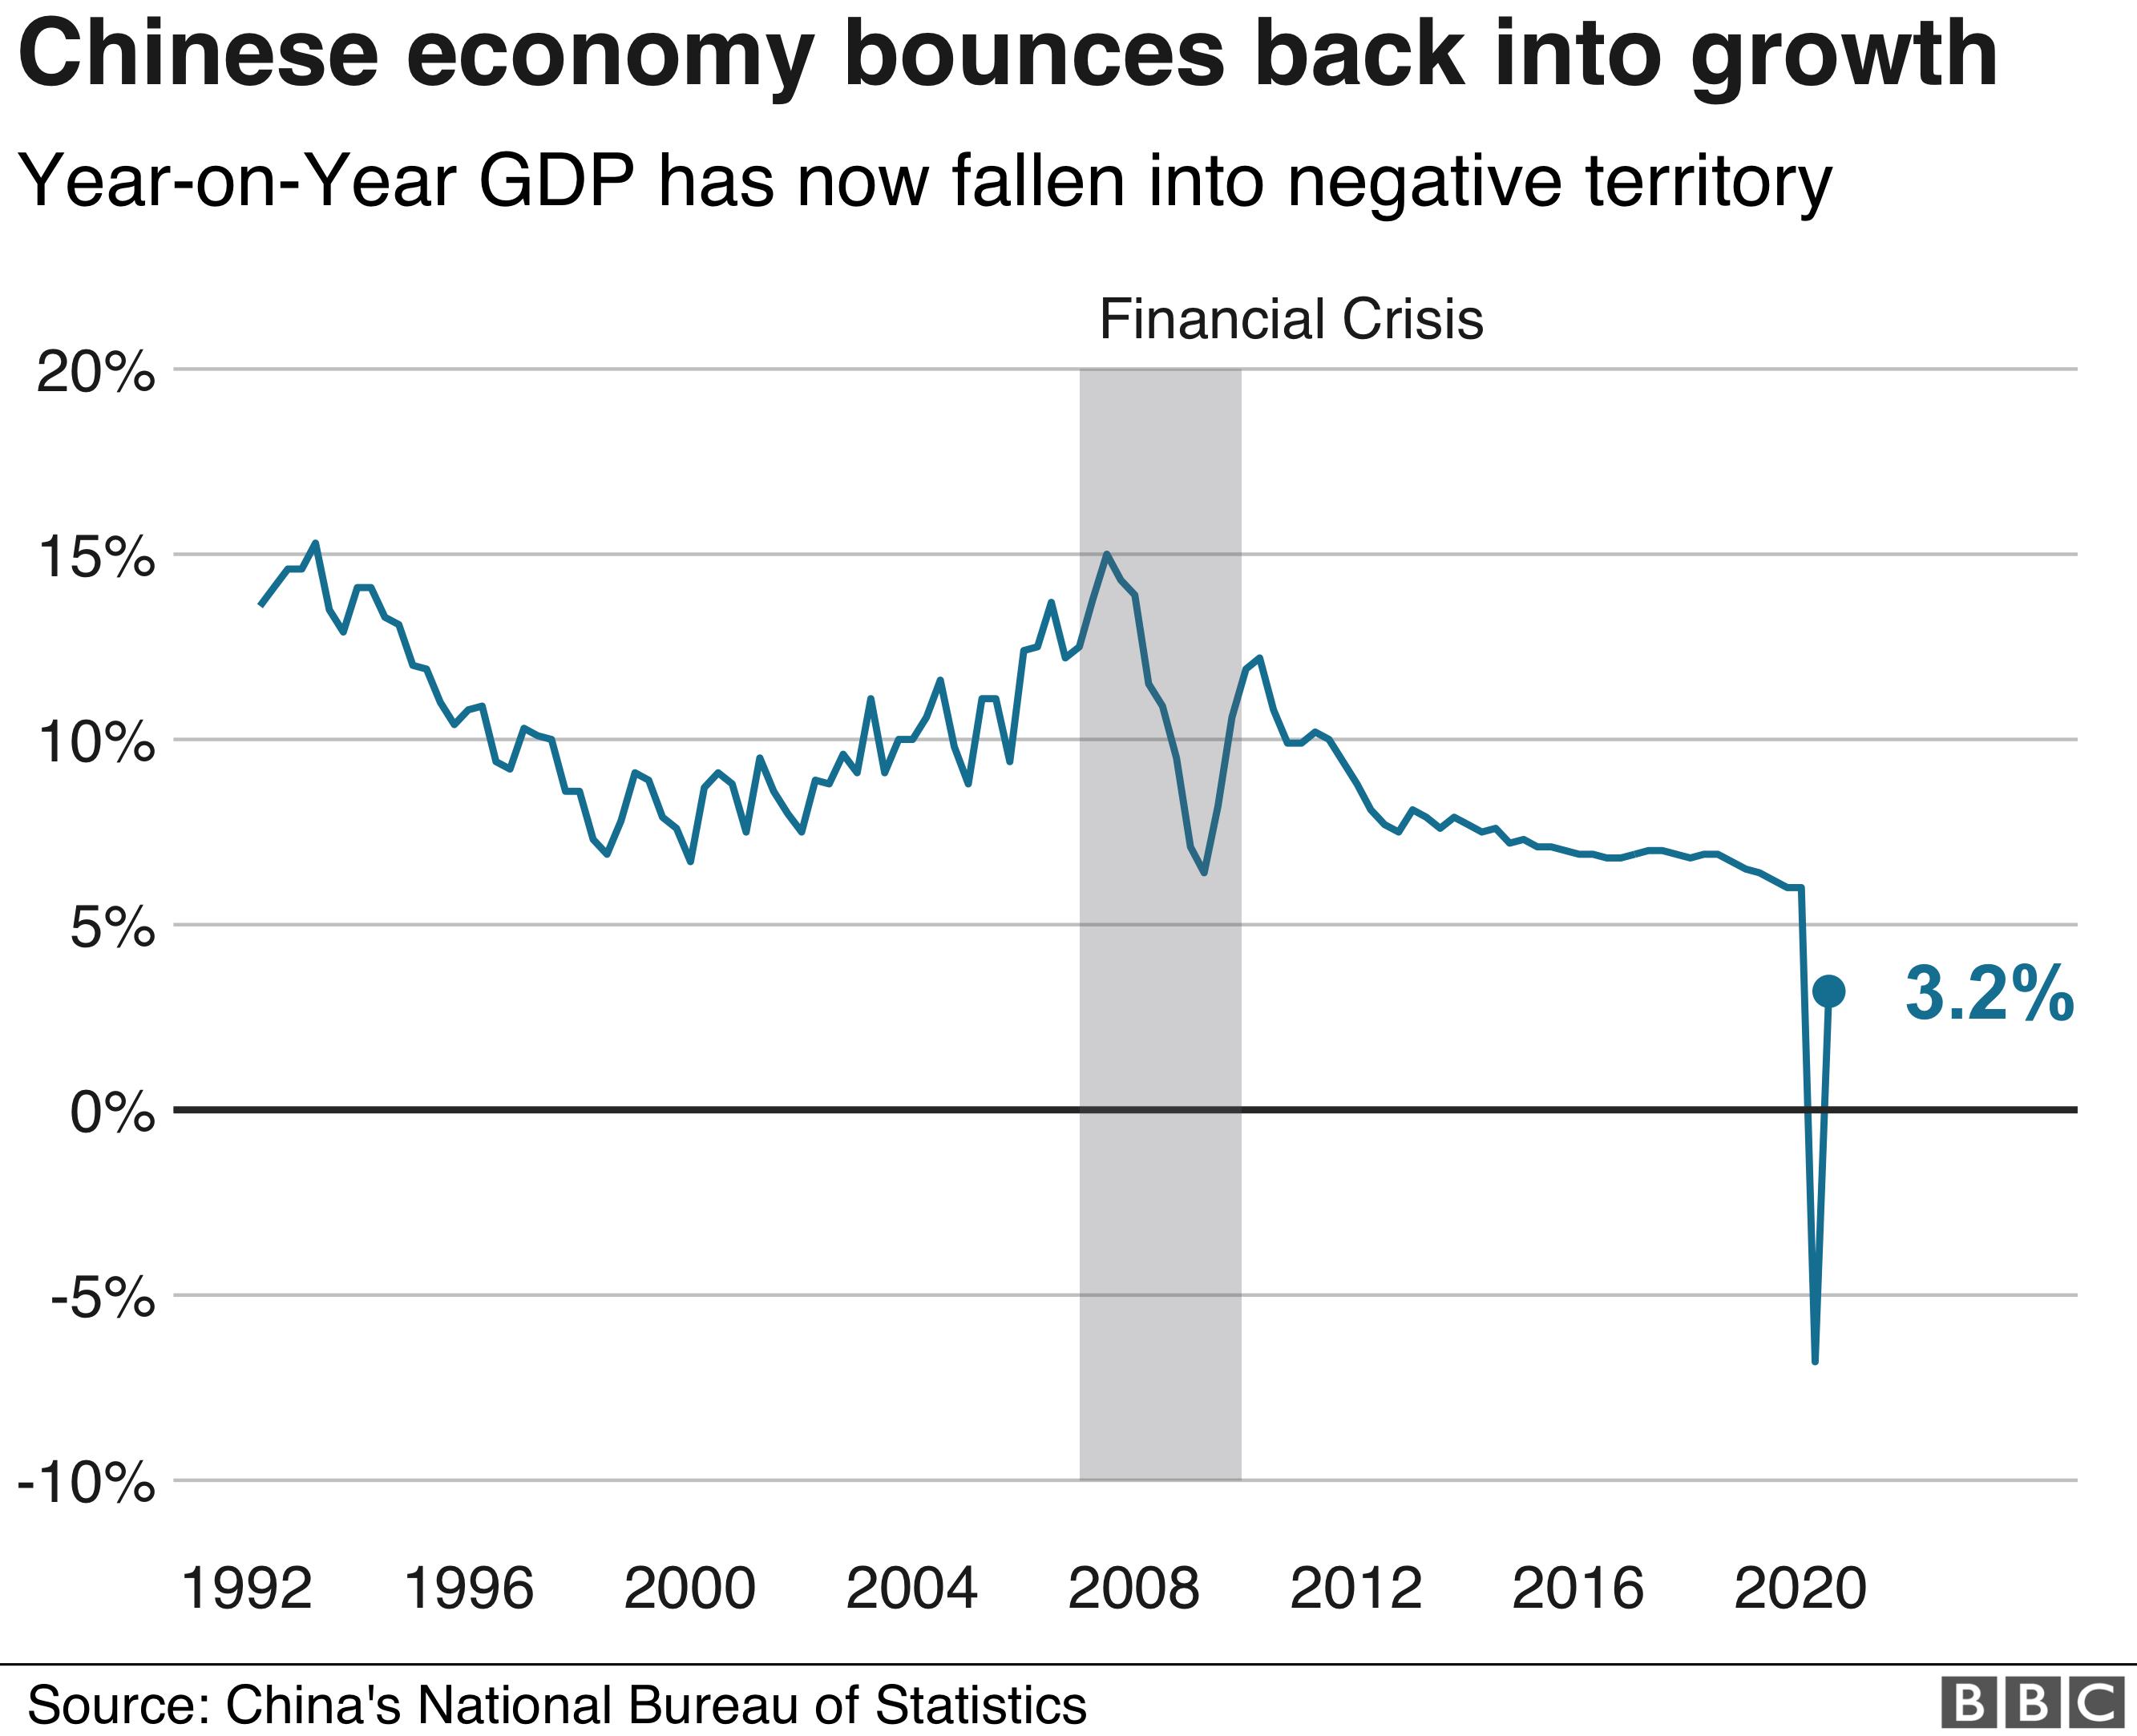 Coronavirus: Chinese economy bounces back into growth - BBC News